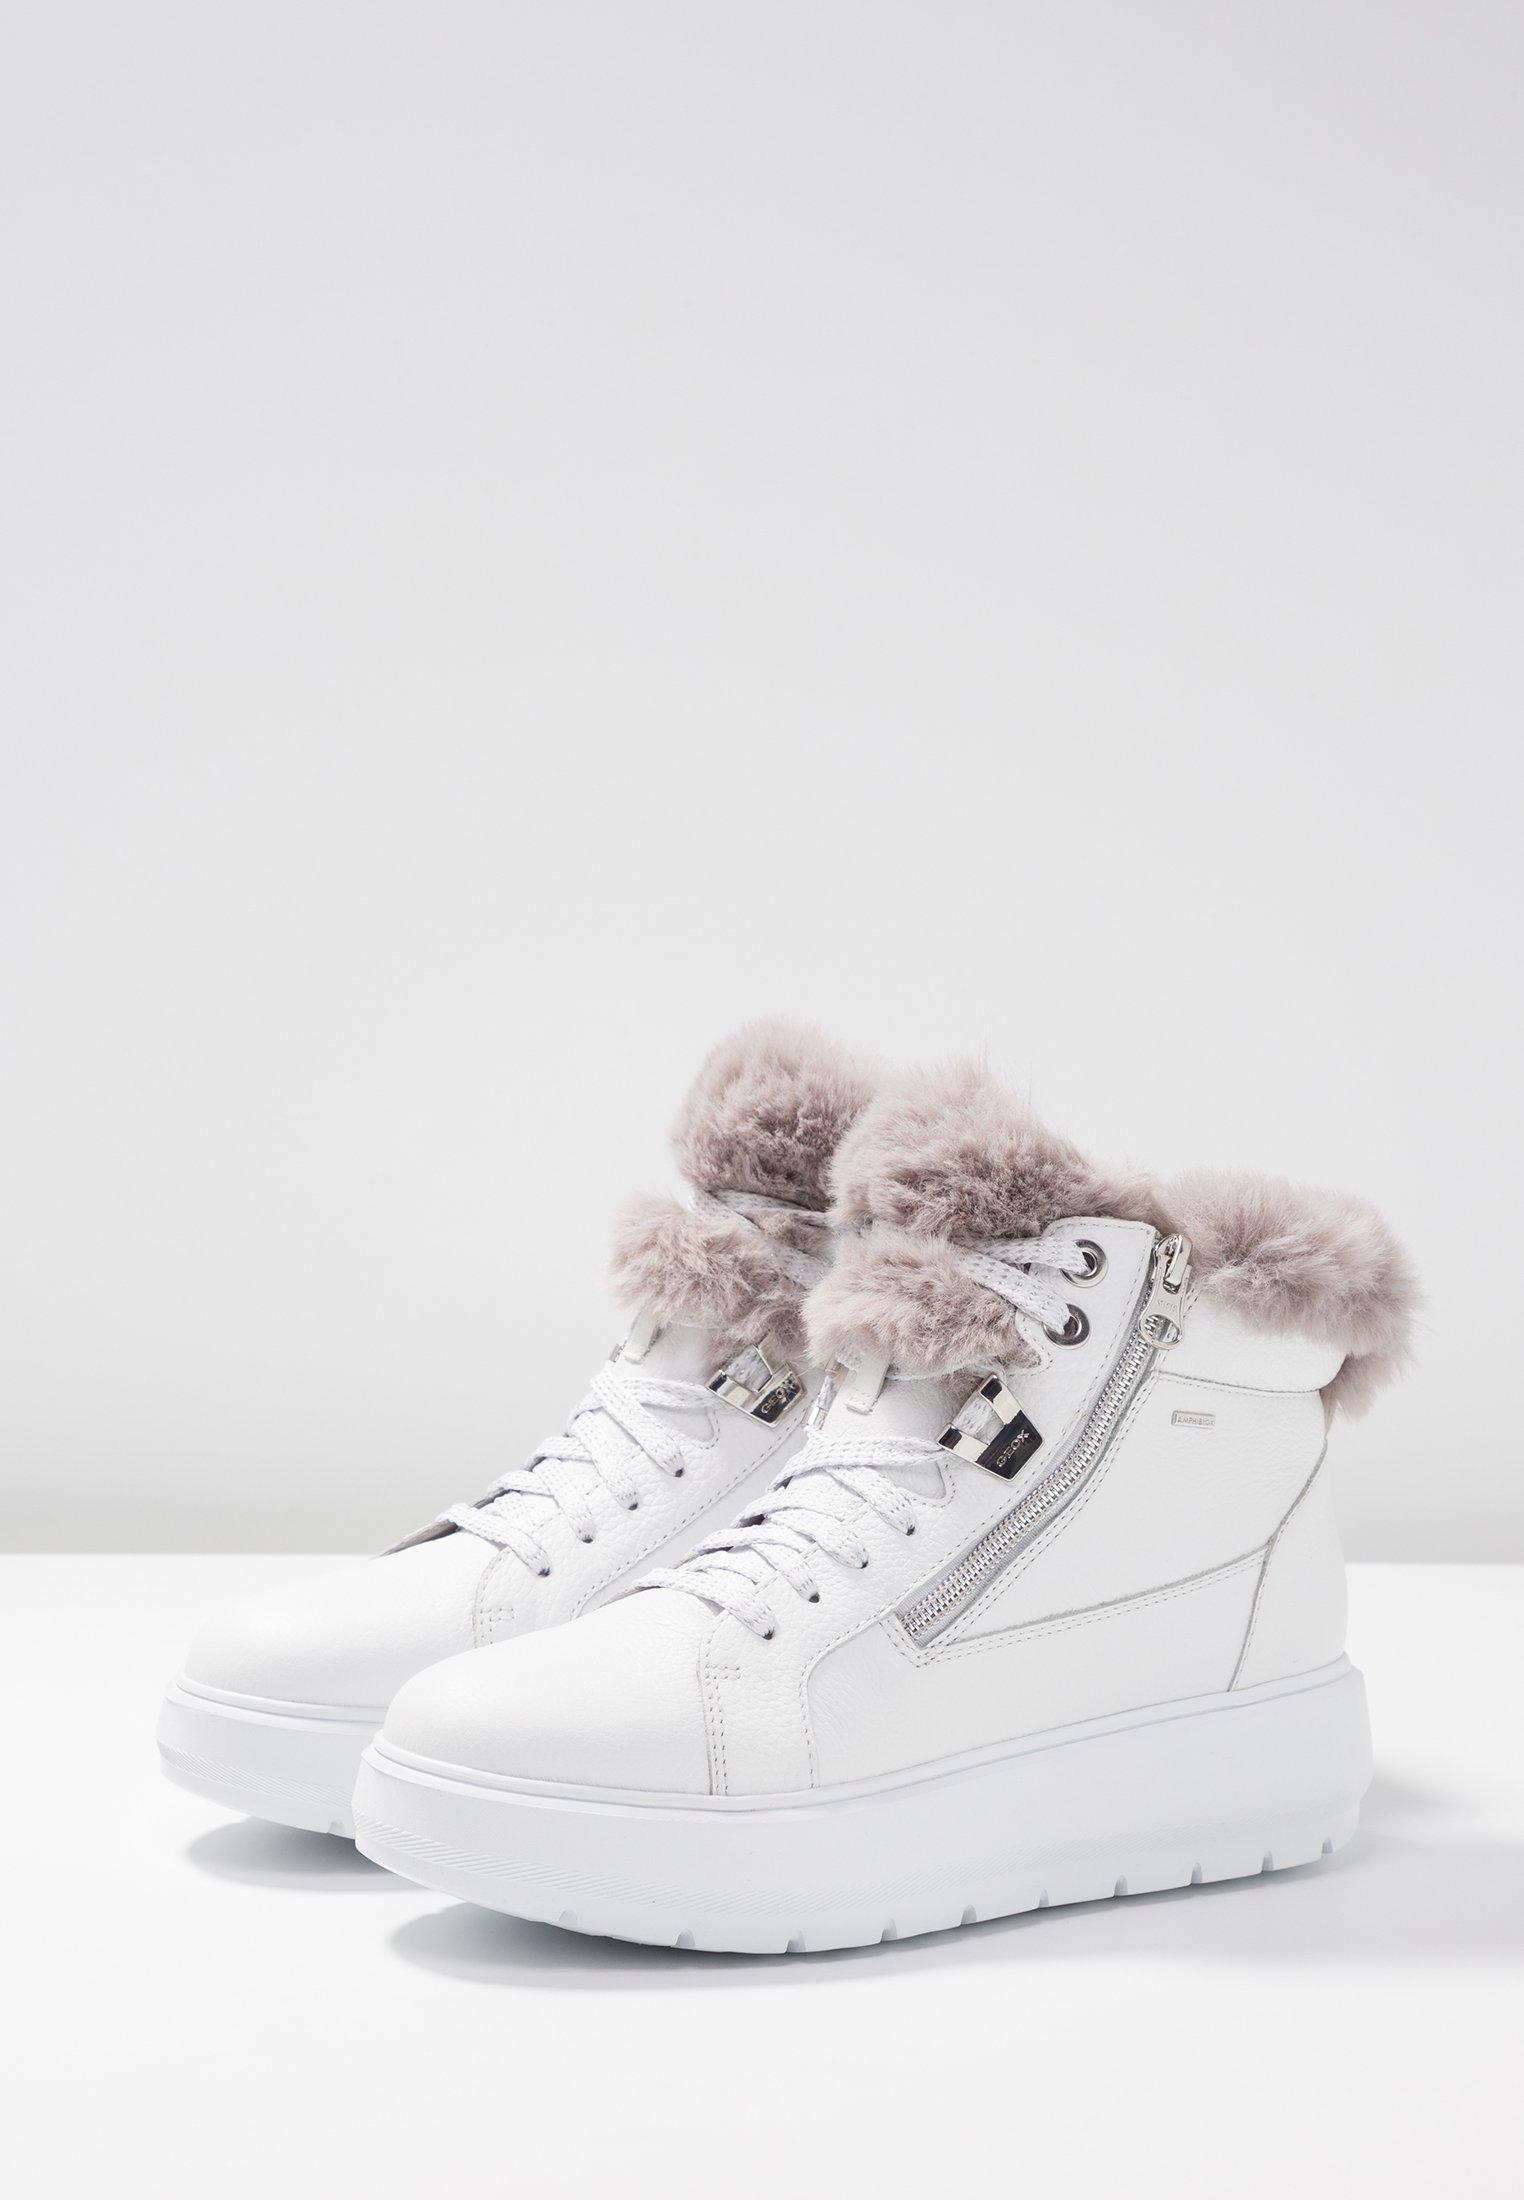 Geox KAULA ABX - Ankelboots - white/dark grey